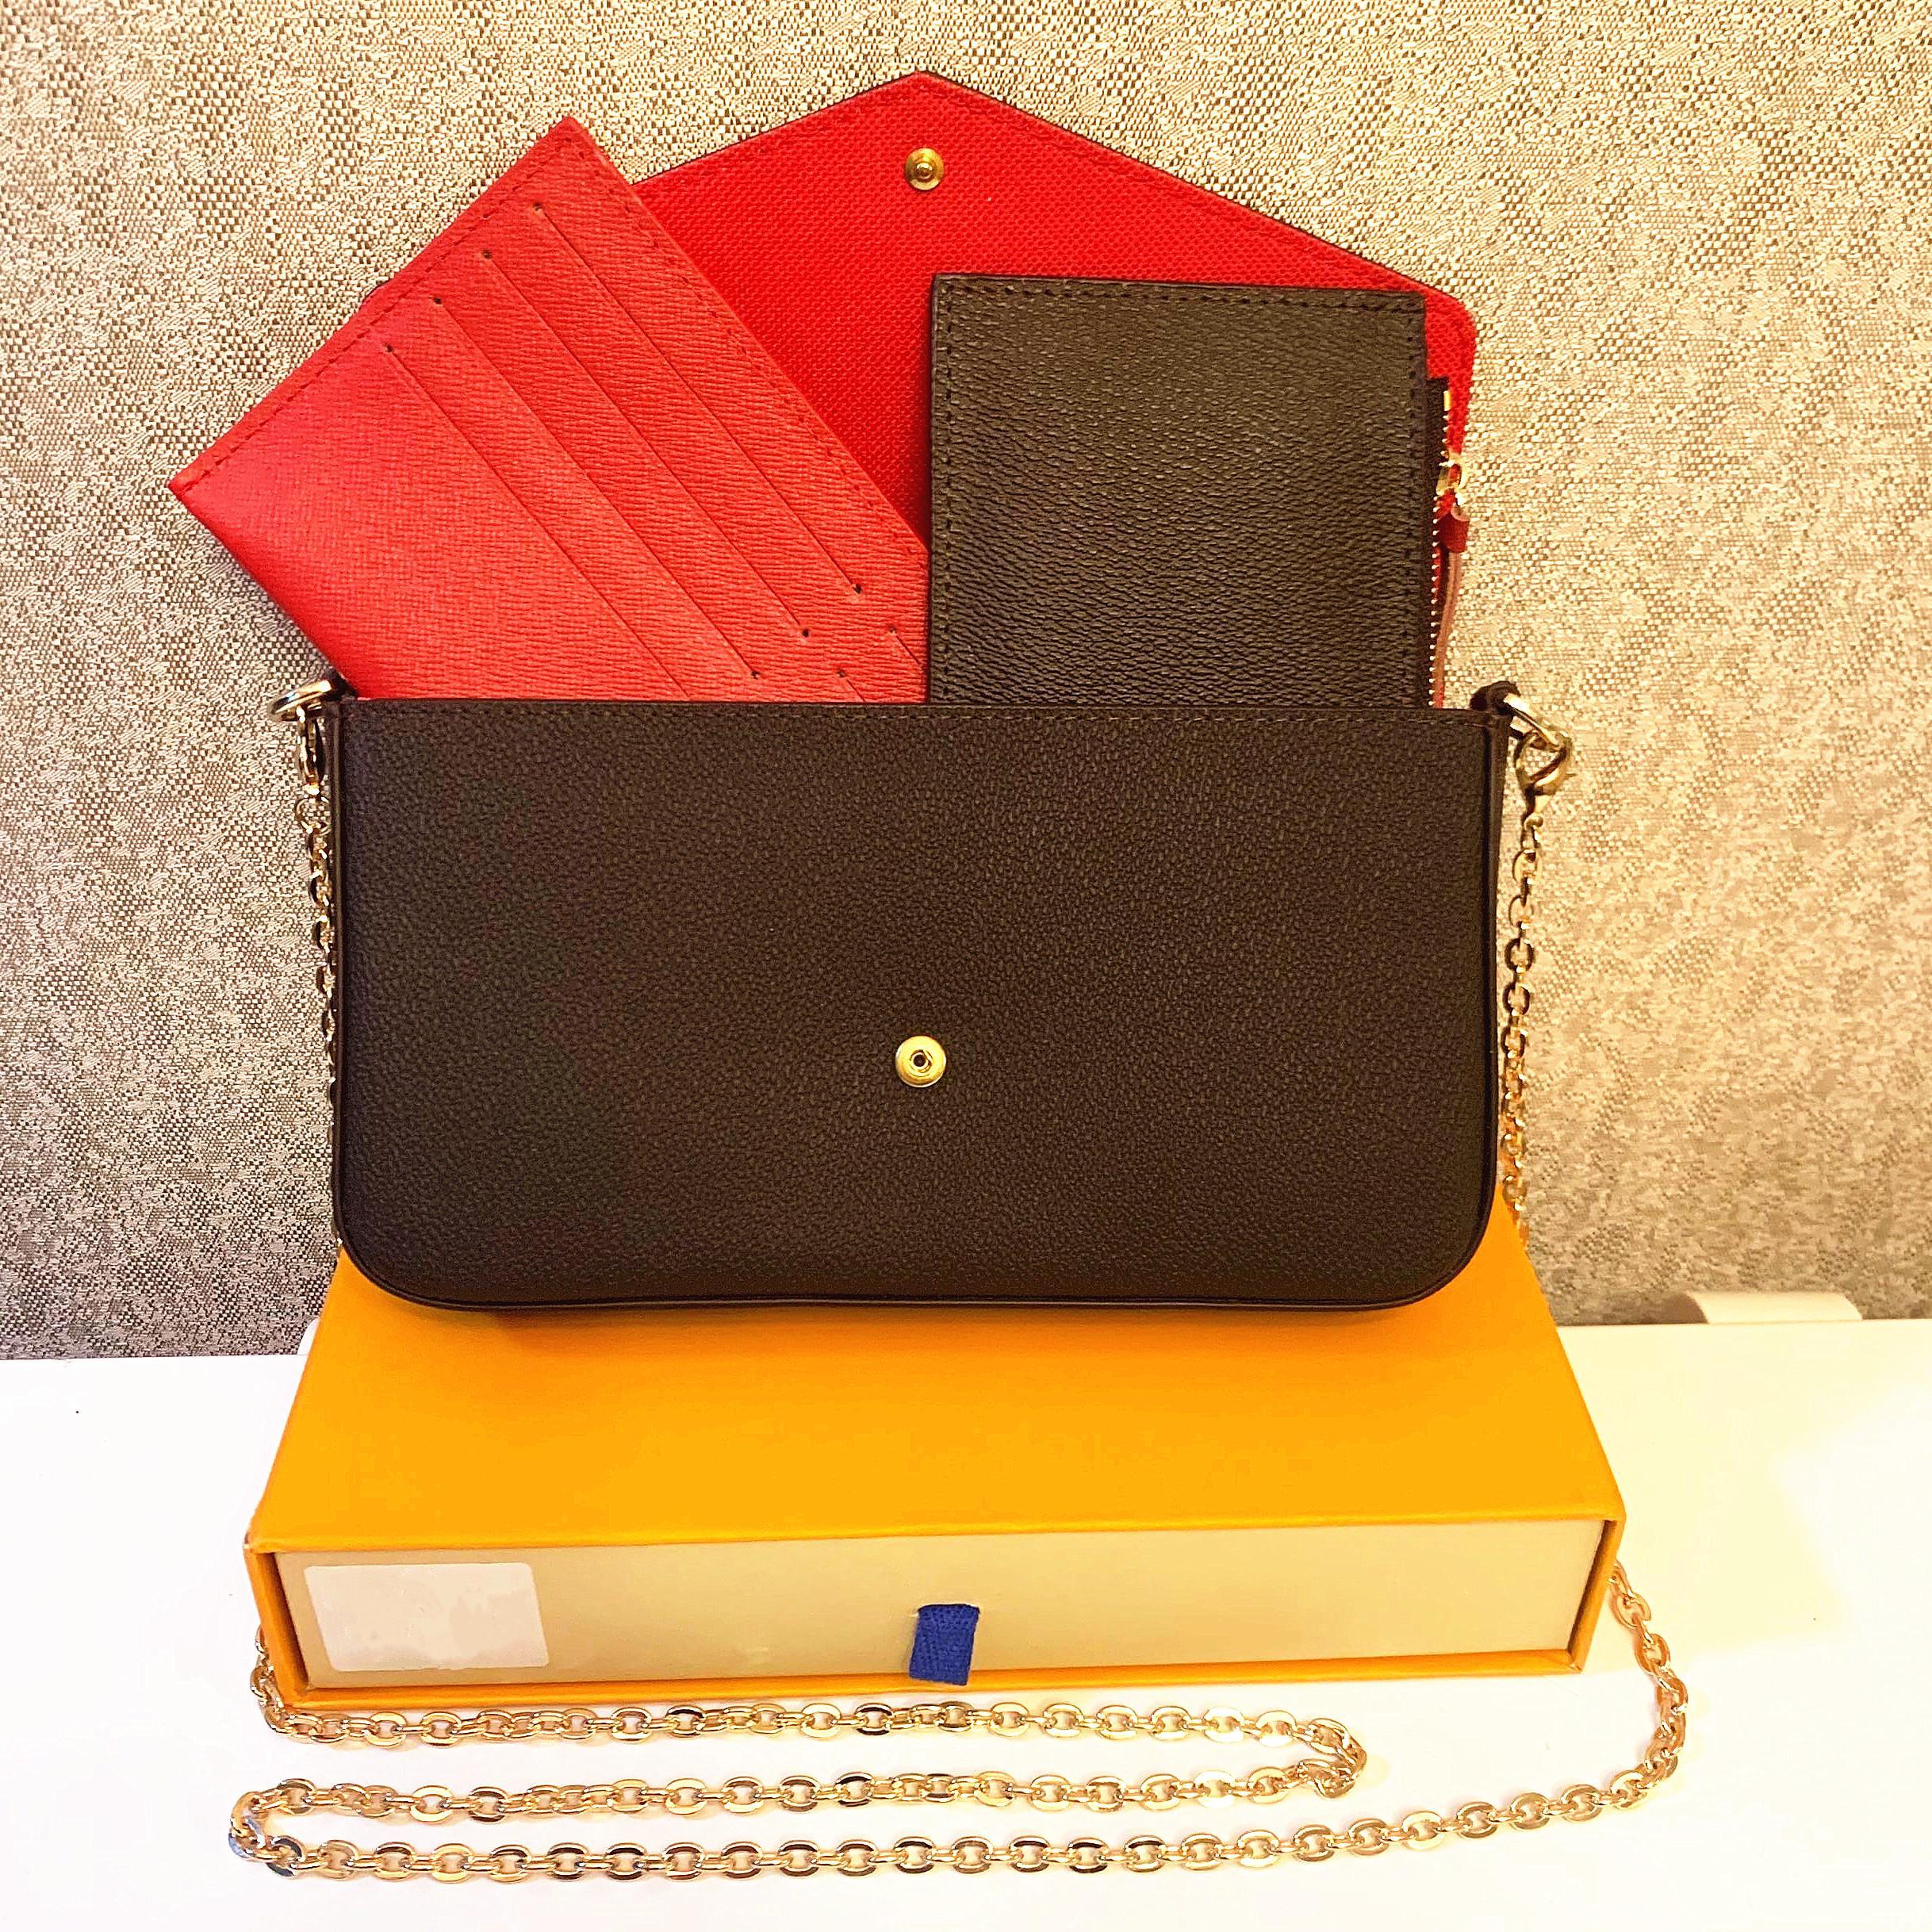 3 PCS / 세트 좋아하는 멀티 포크 액세서리 여성 크로스 바디 지갑 메신저 가방 핸드백 꽃 디자이너 어깨 레이디 가죽 상자